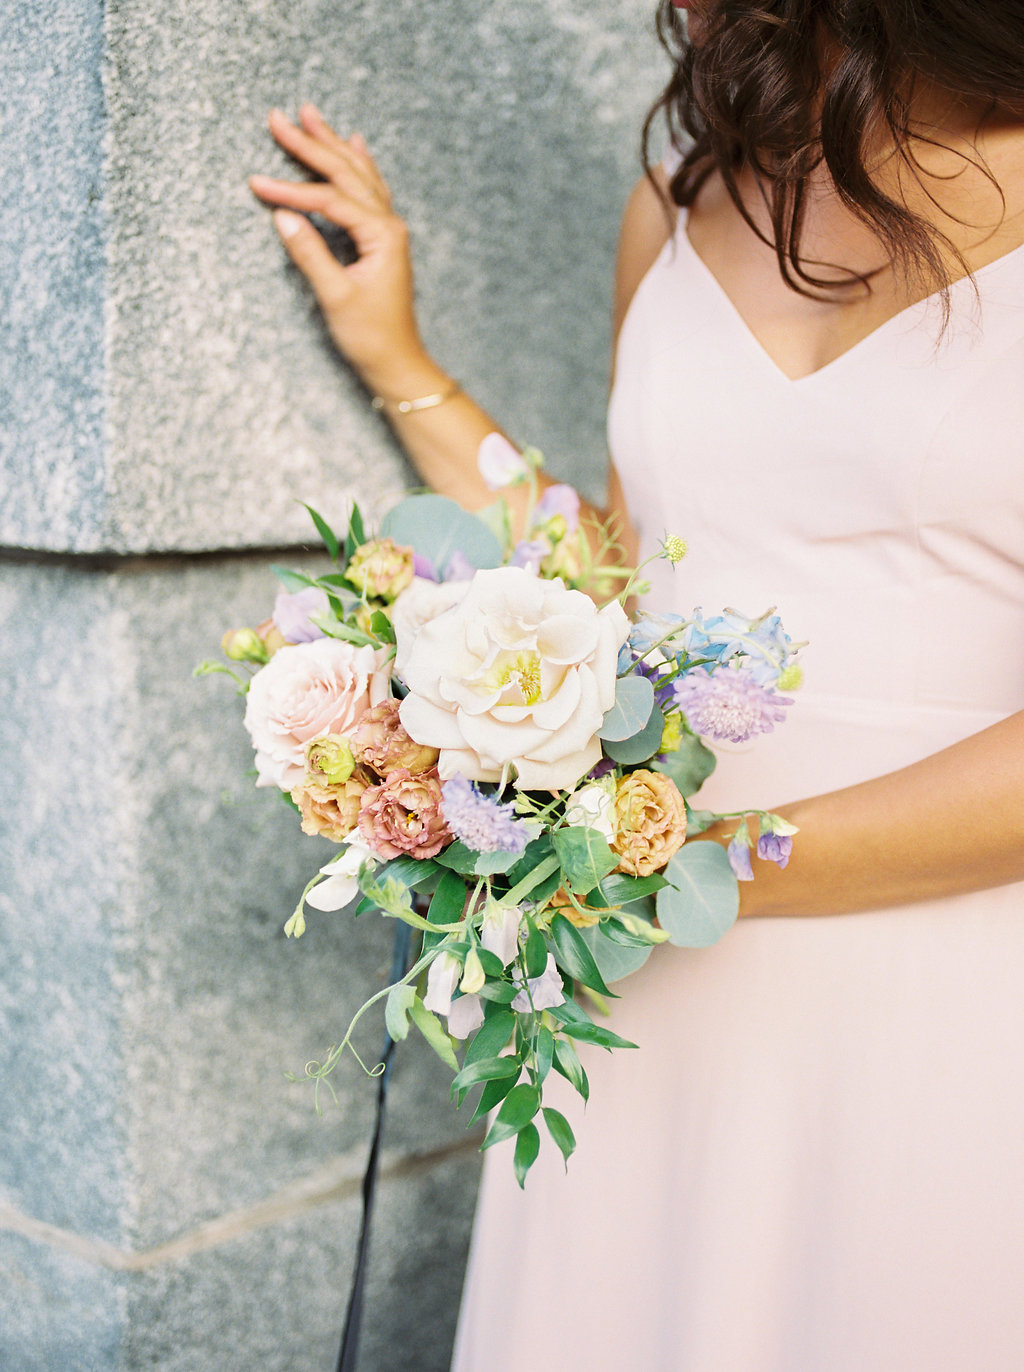 Organic Blush Bridal Bouquet - Stone House Creative